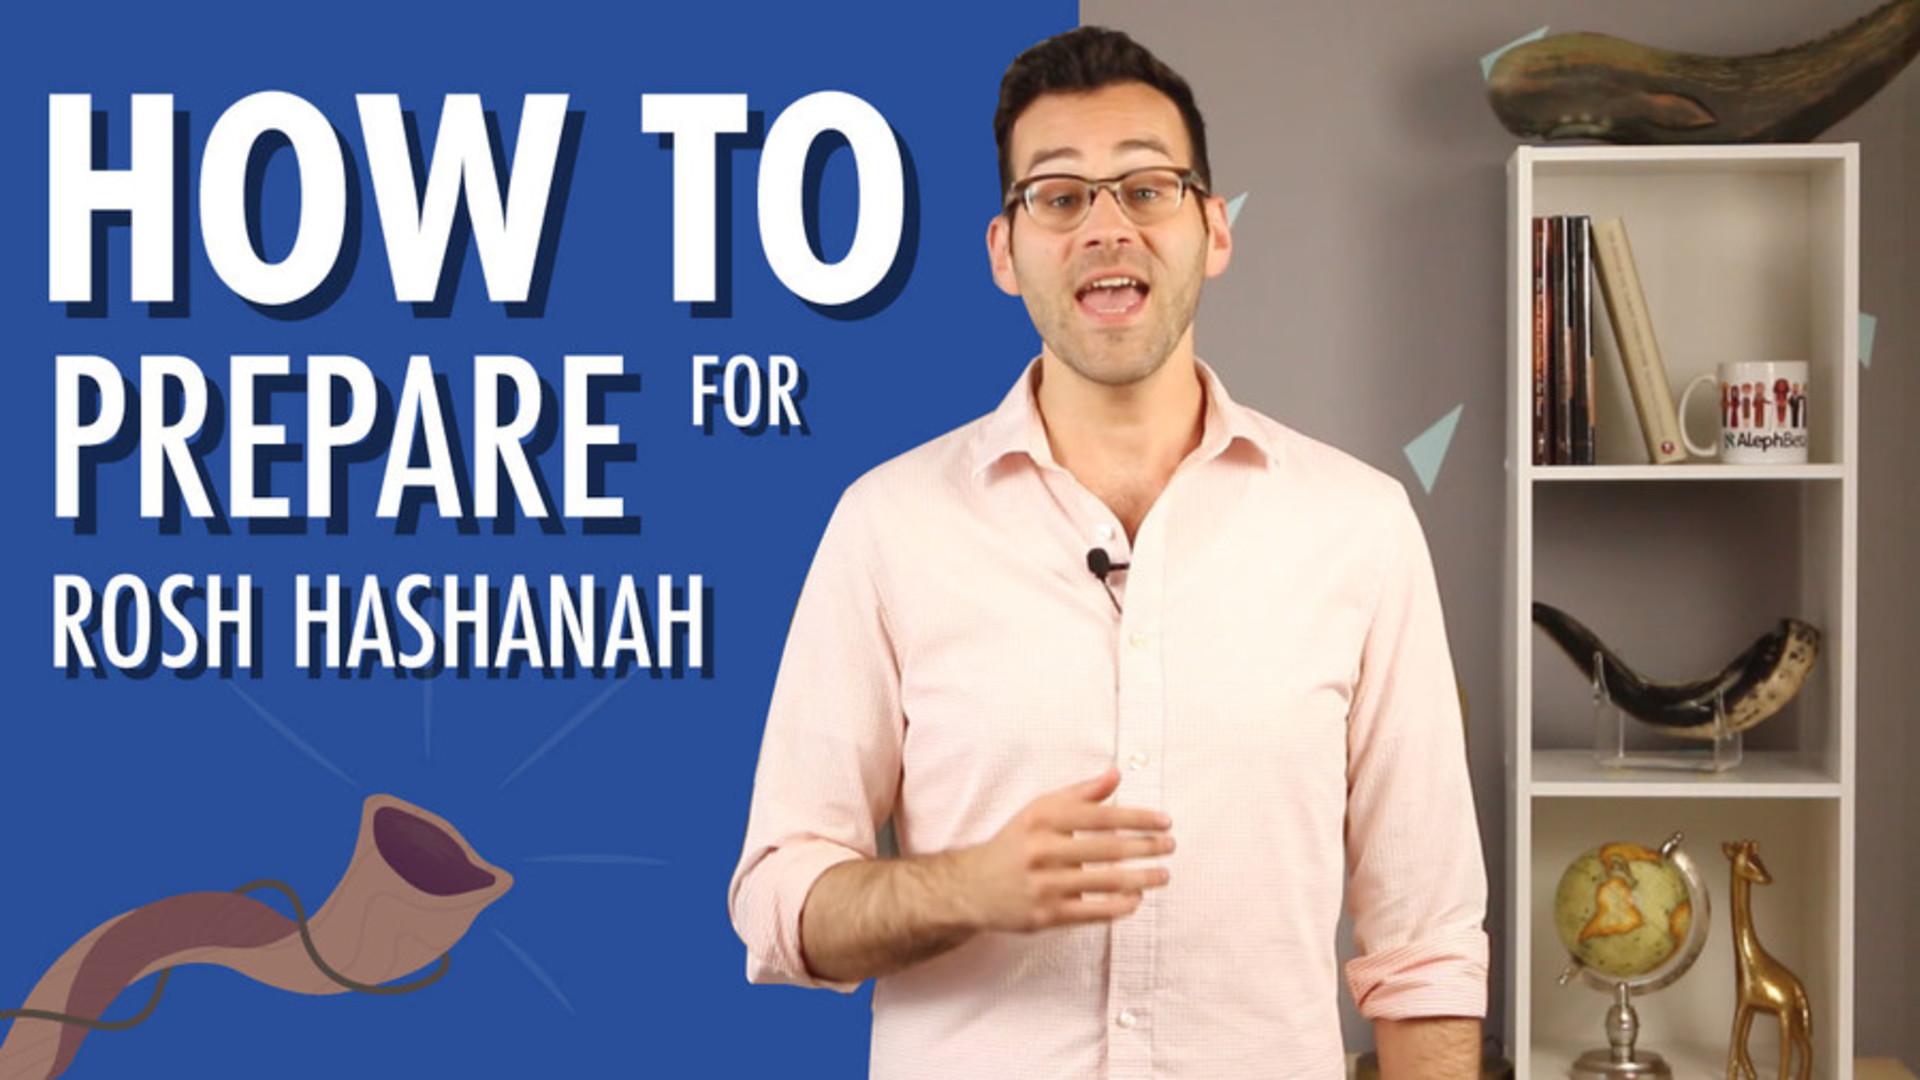 rosh hashanah spiritual preparation guide